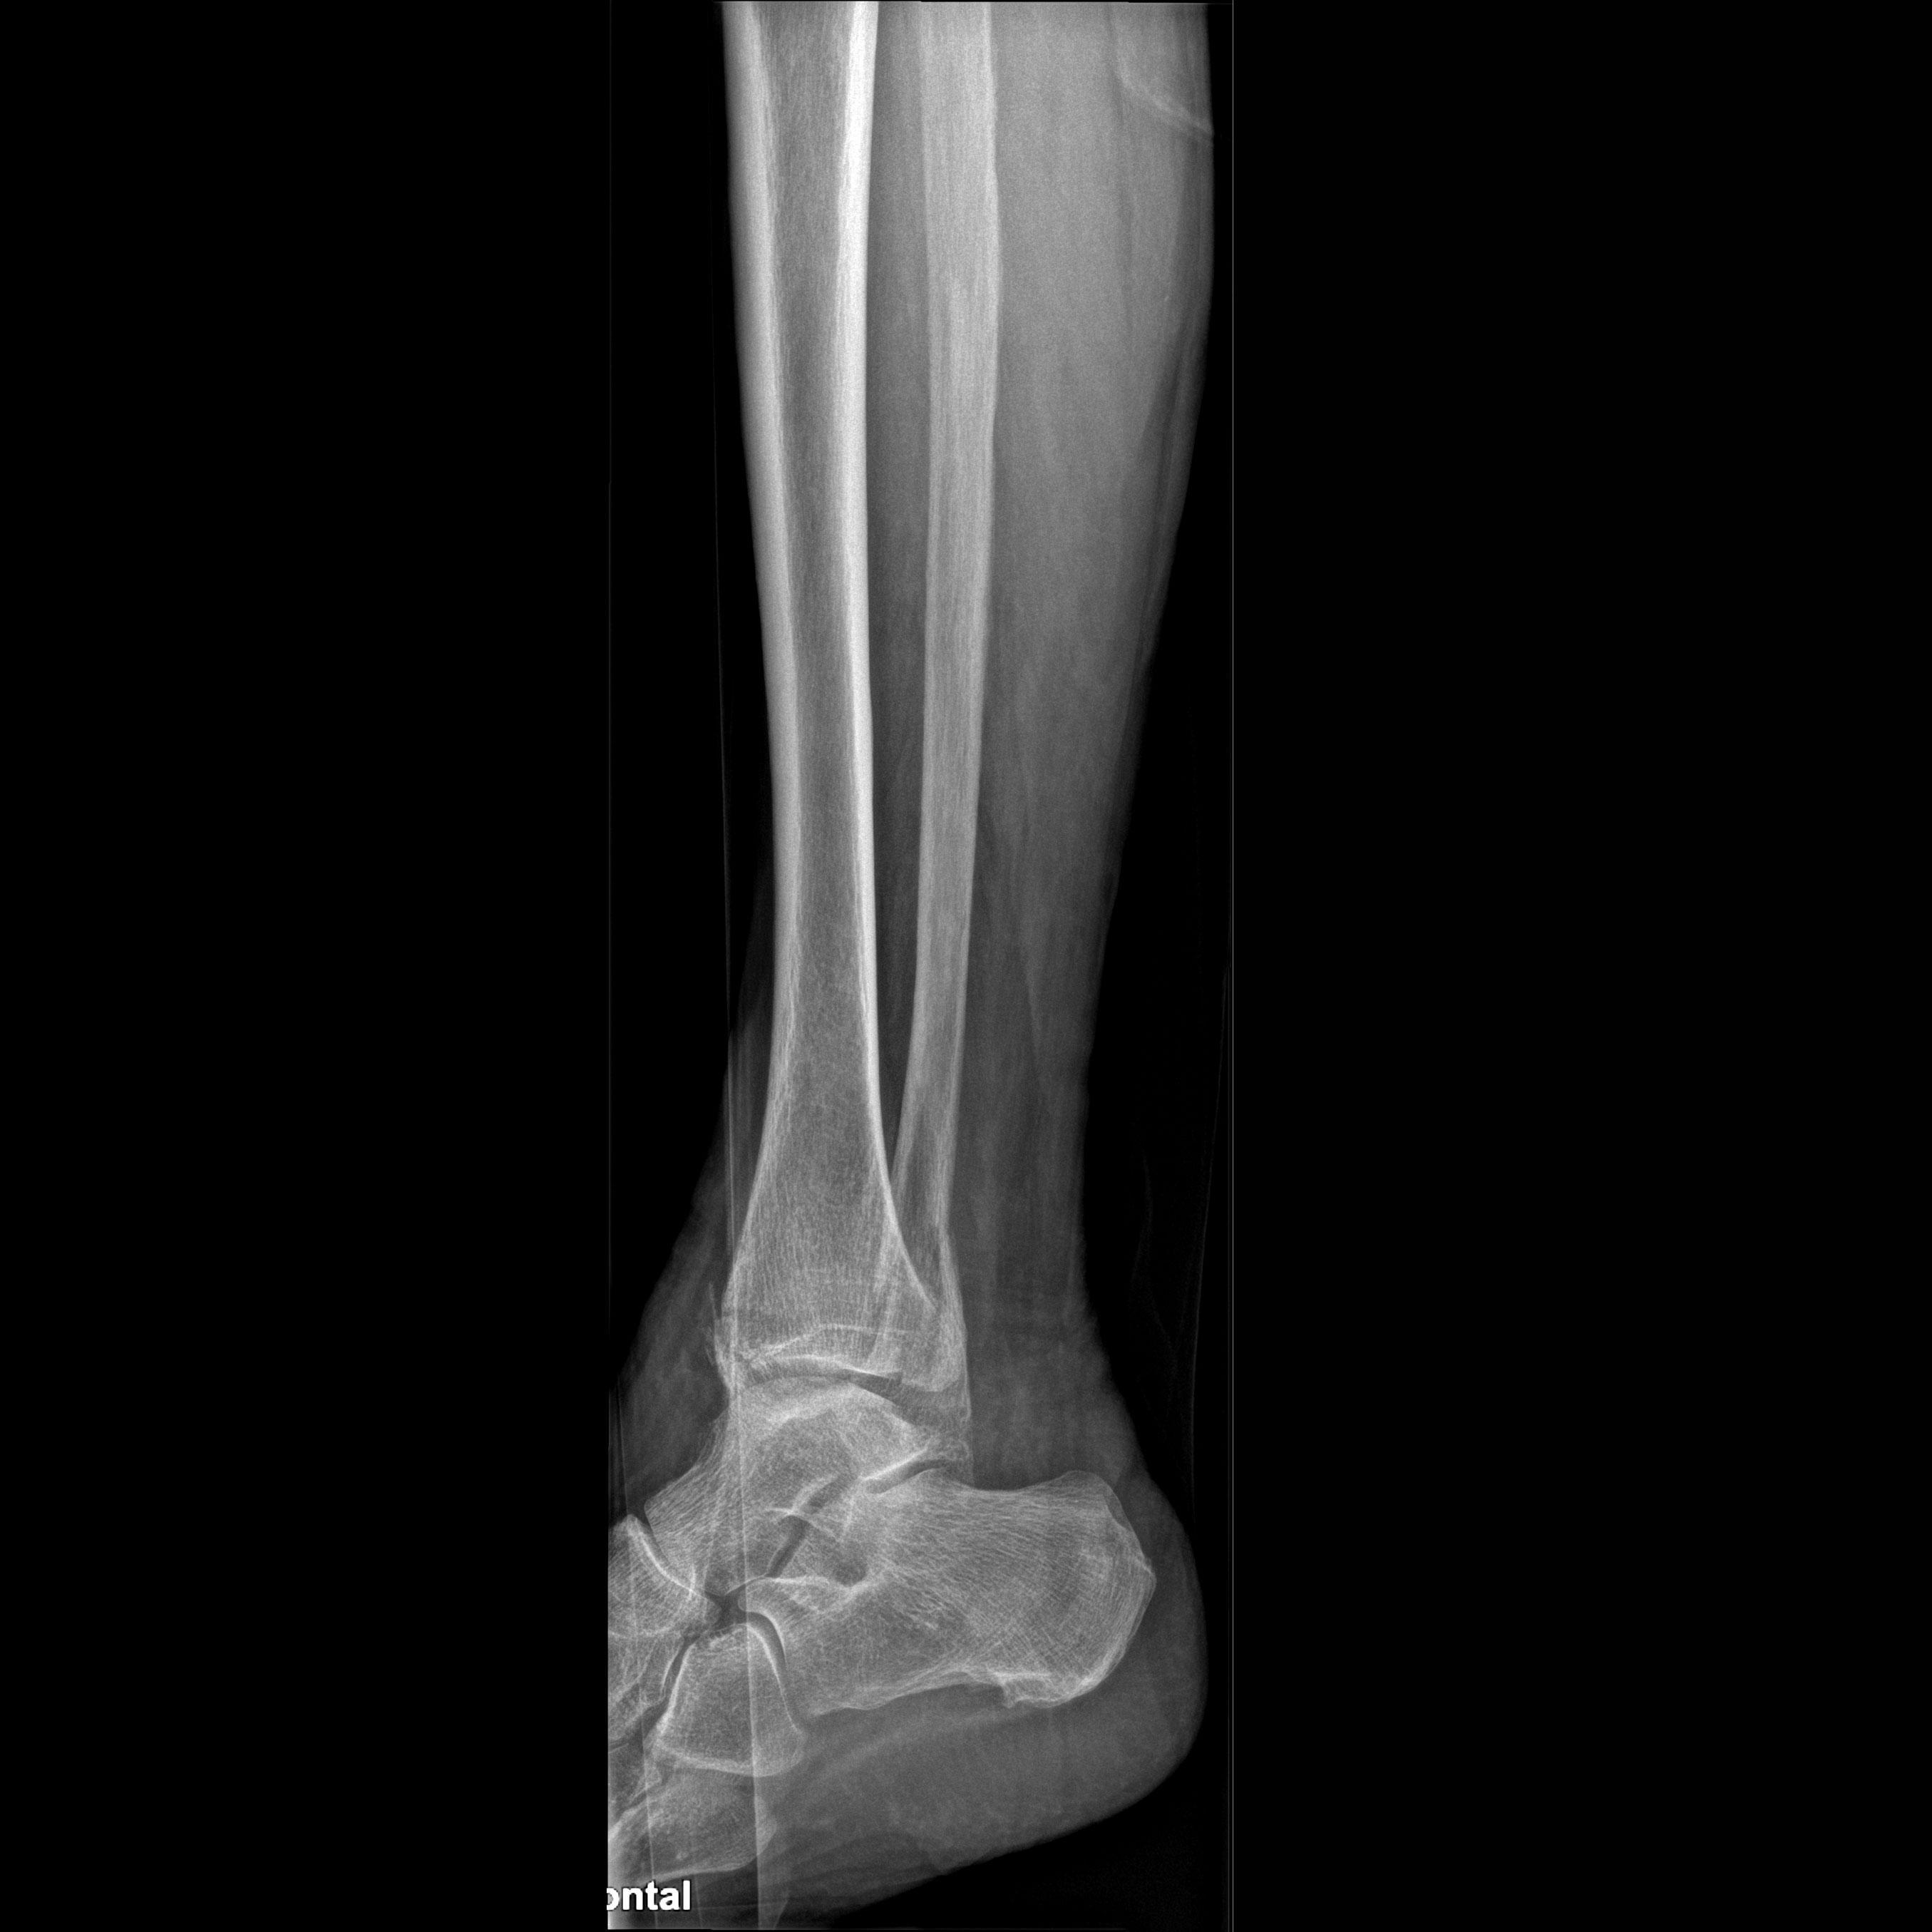 Mobilett Mira Max Ankle lat Image